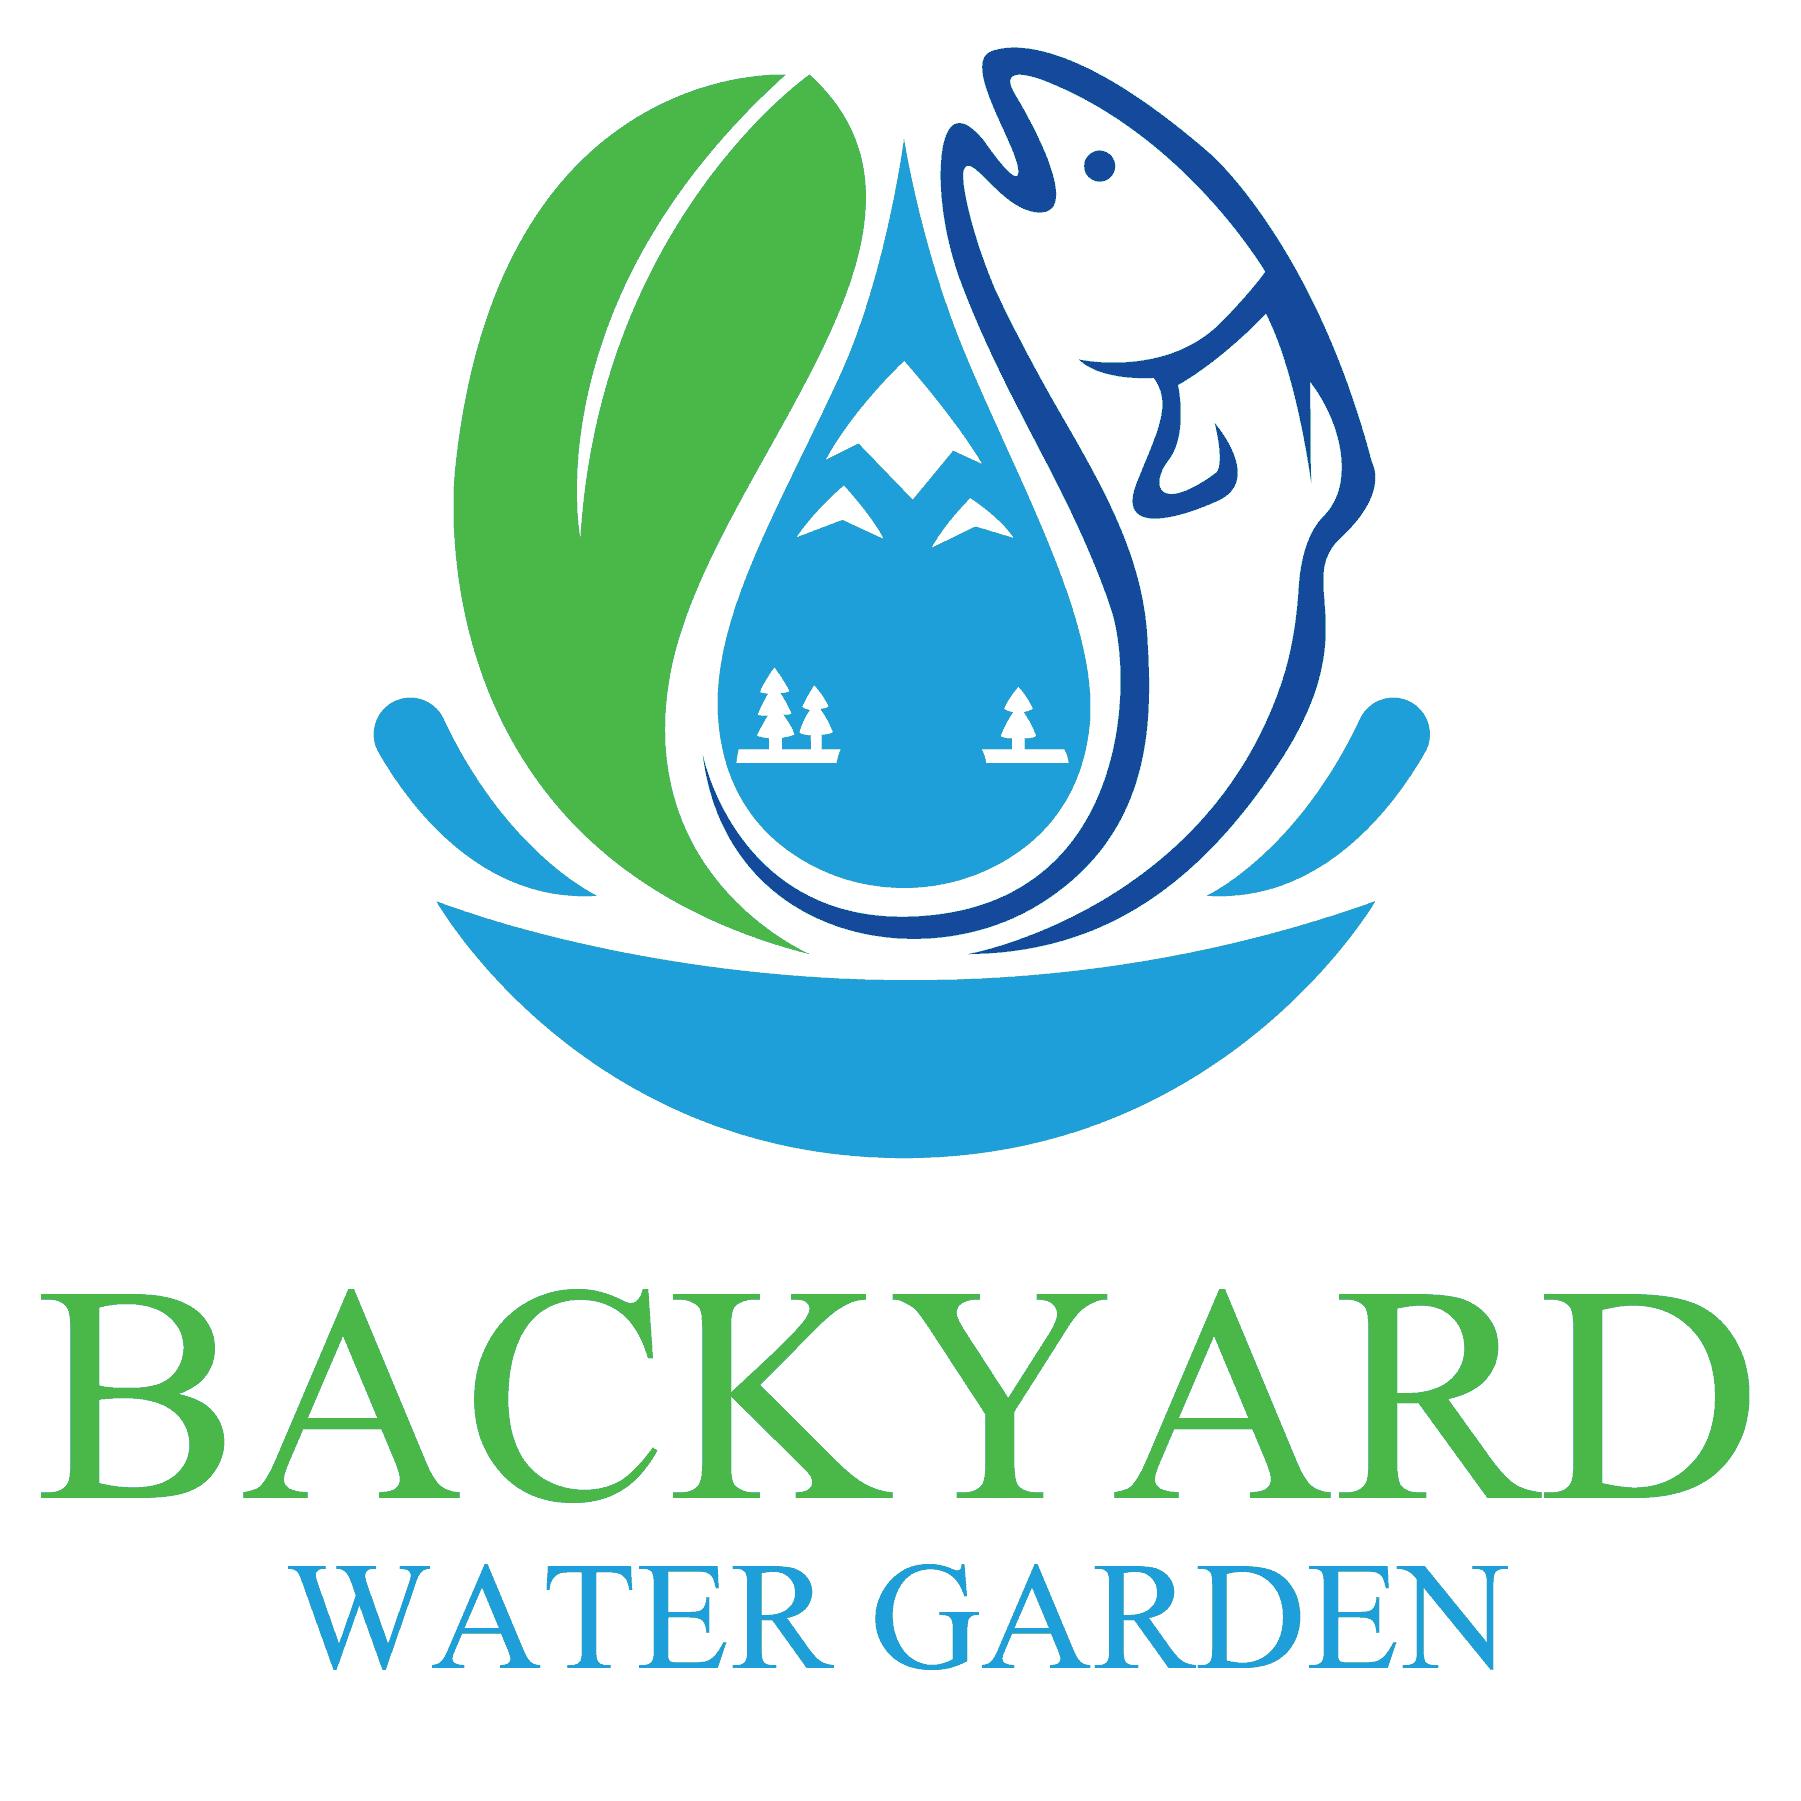 transparent backyard water garden logo